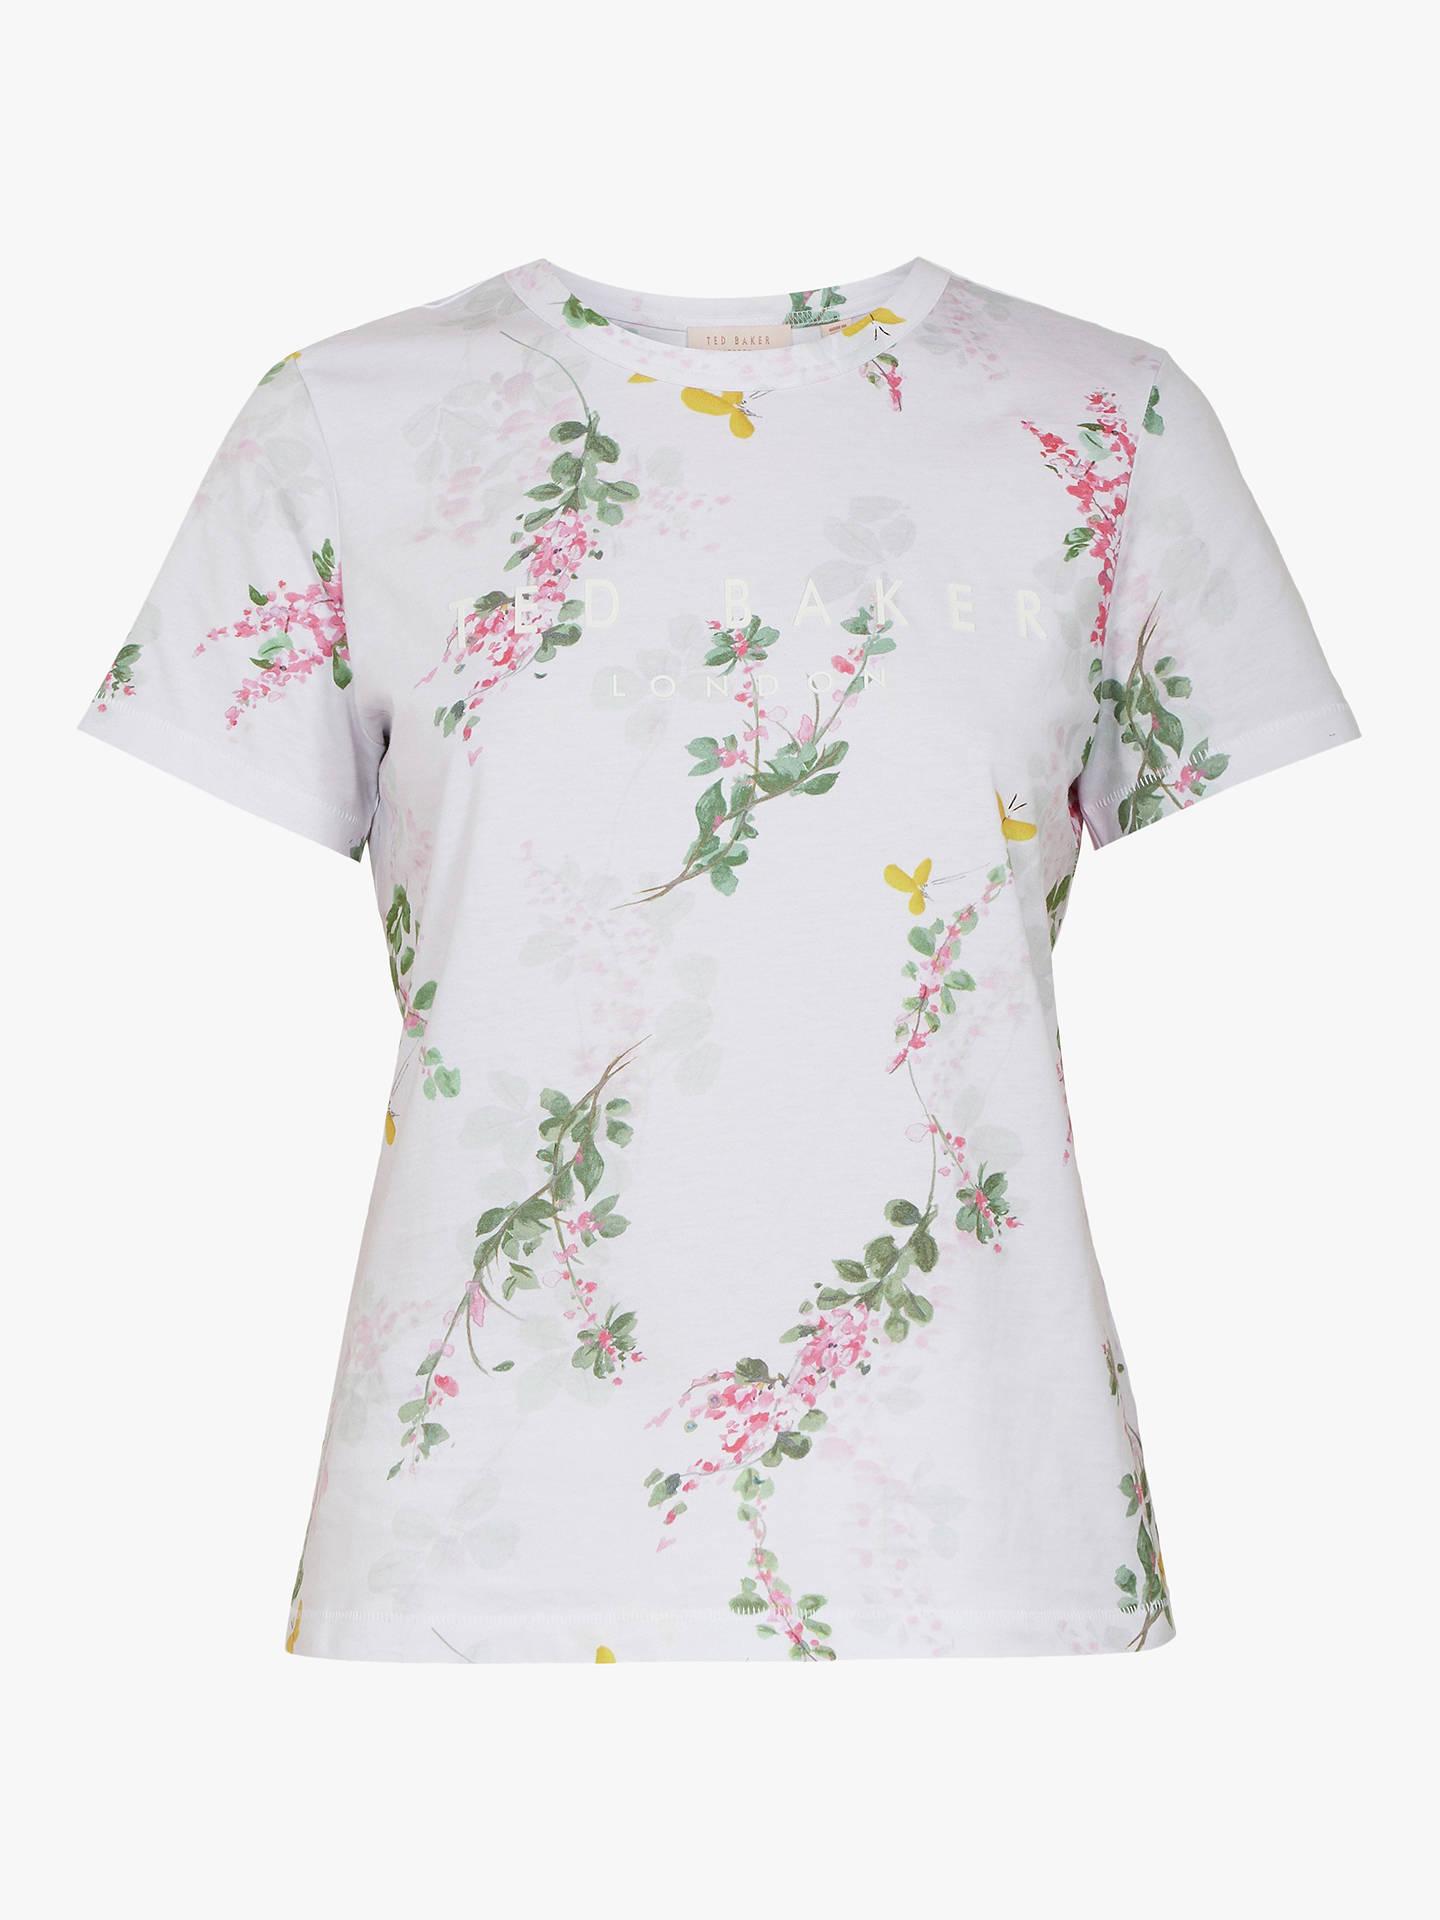 dce847cf1cd233 ... Buy Ted Baker Malvani Floral Print Slogan T-Shirt, White, S Online at